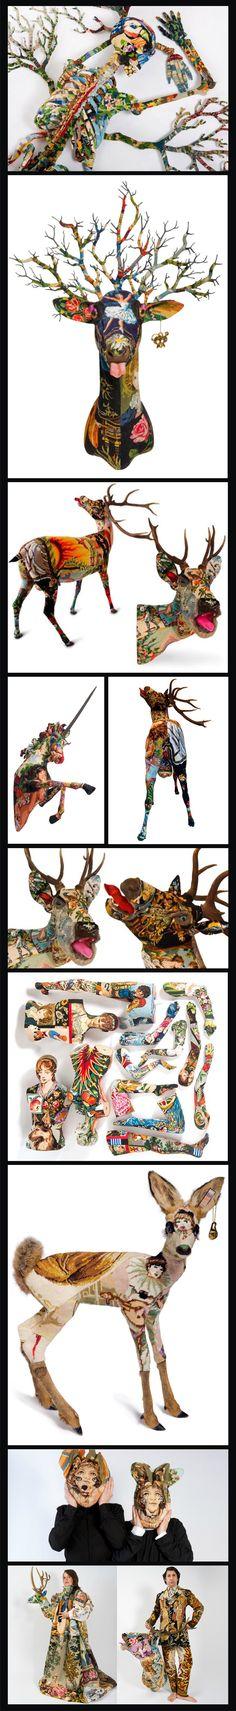 Frédérique Morrel Frederique, Photo Manipulation, Love Art, Needlepoint, Surrealism, Samurai, Mixed Media, Collage, Illustration